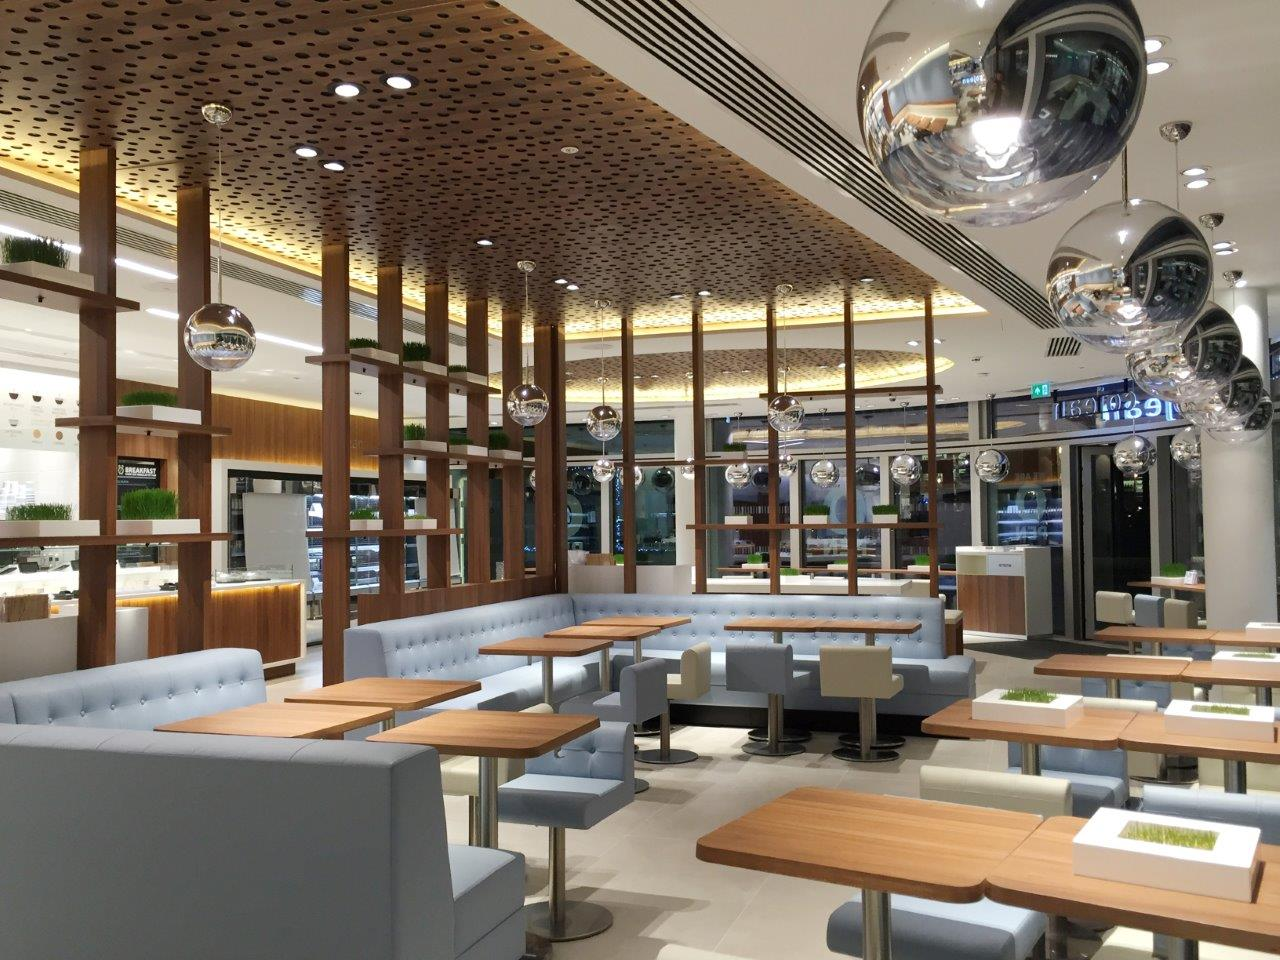 Jamie S Kitchen Adelaide